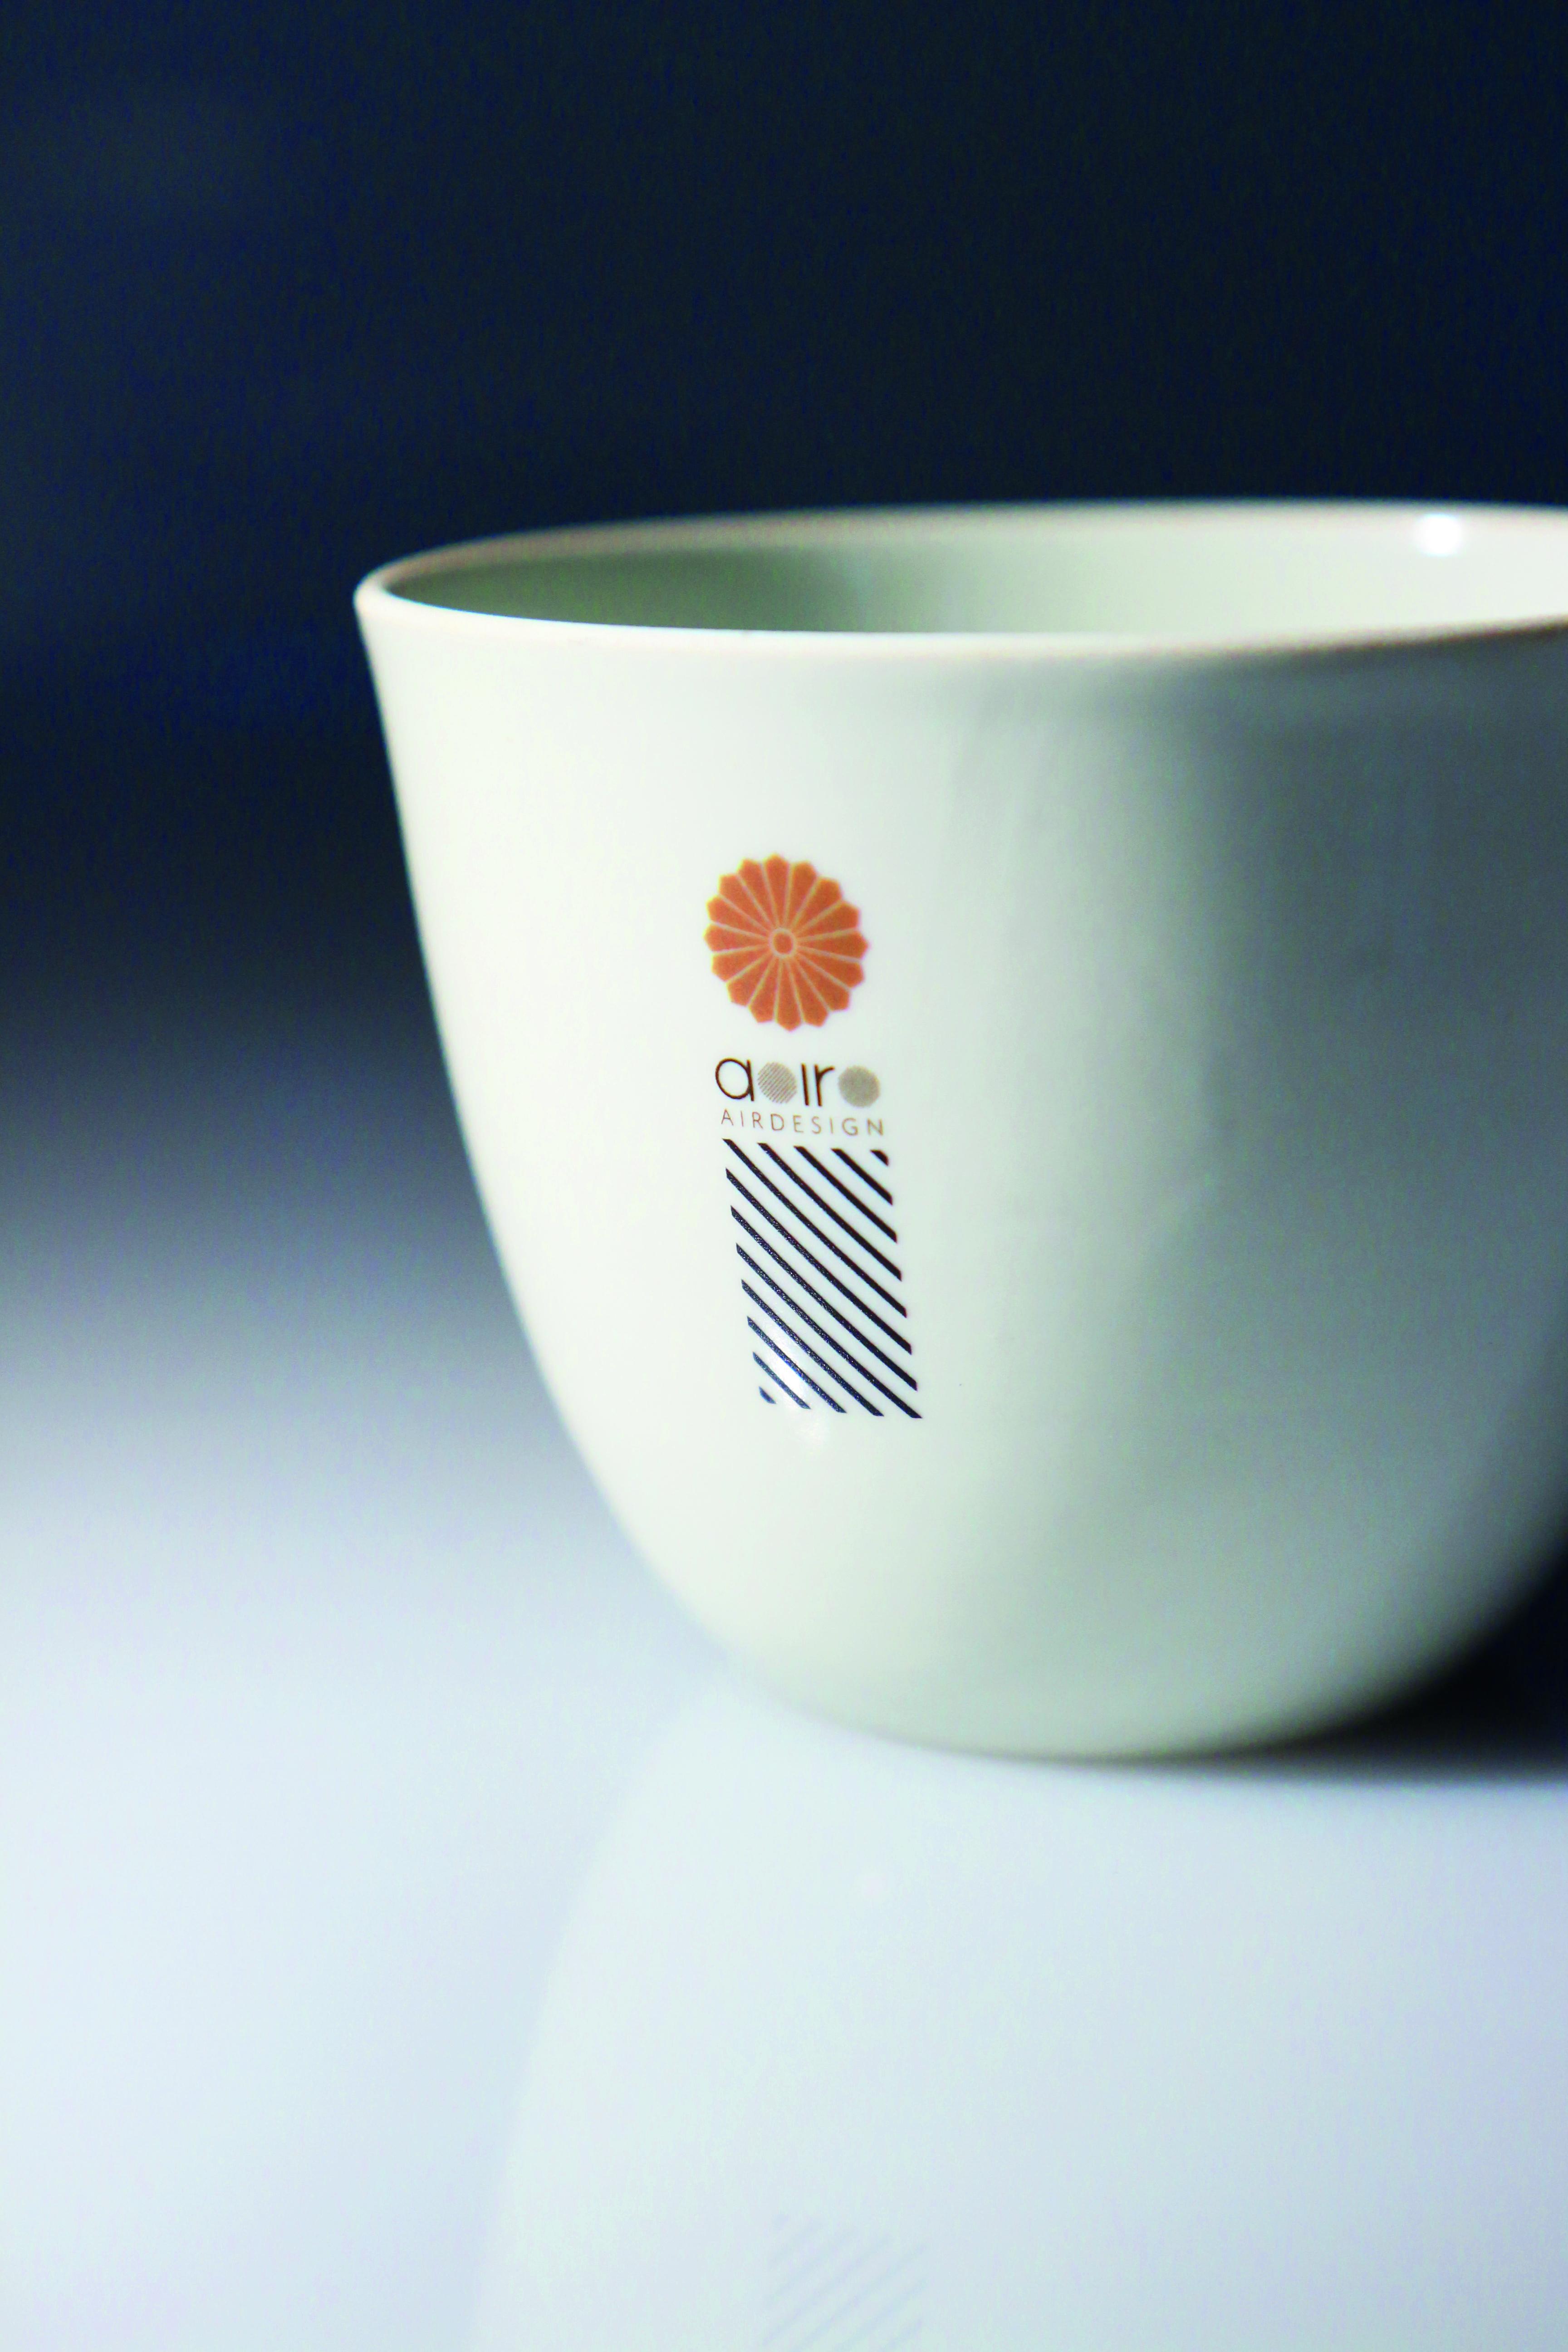 Bemusterung Digitaldruck / UV-Druck / Formkörperdruck auf Tasse